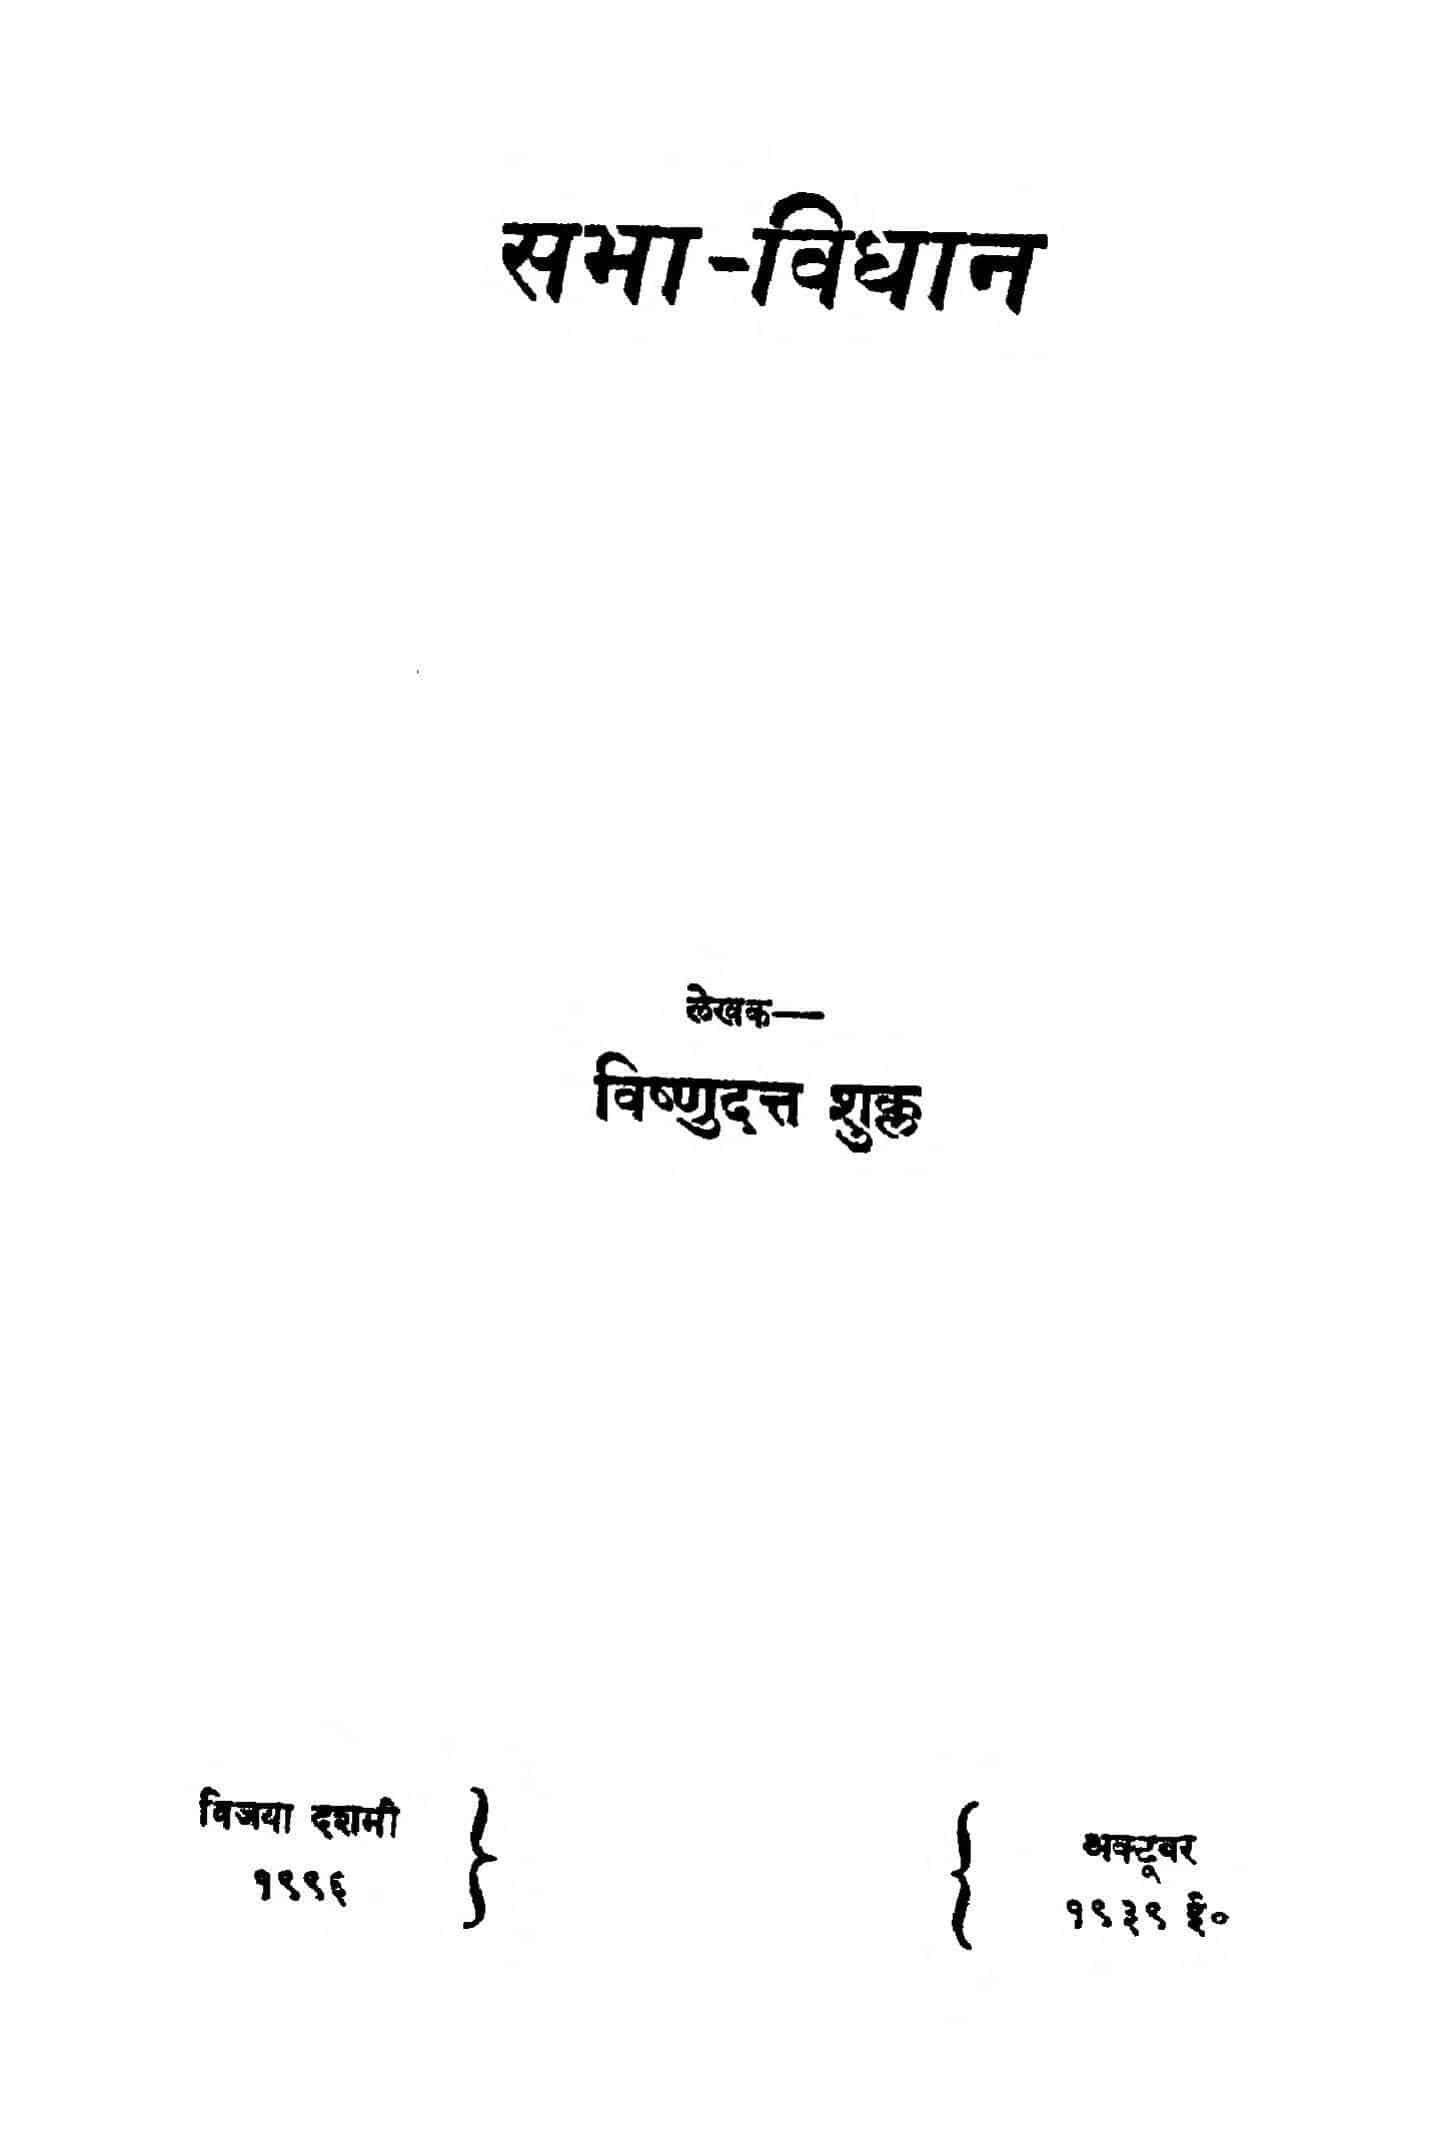 Book Image : सभा - विधान - Sabha Vidhan